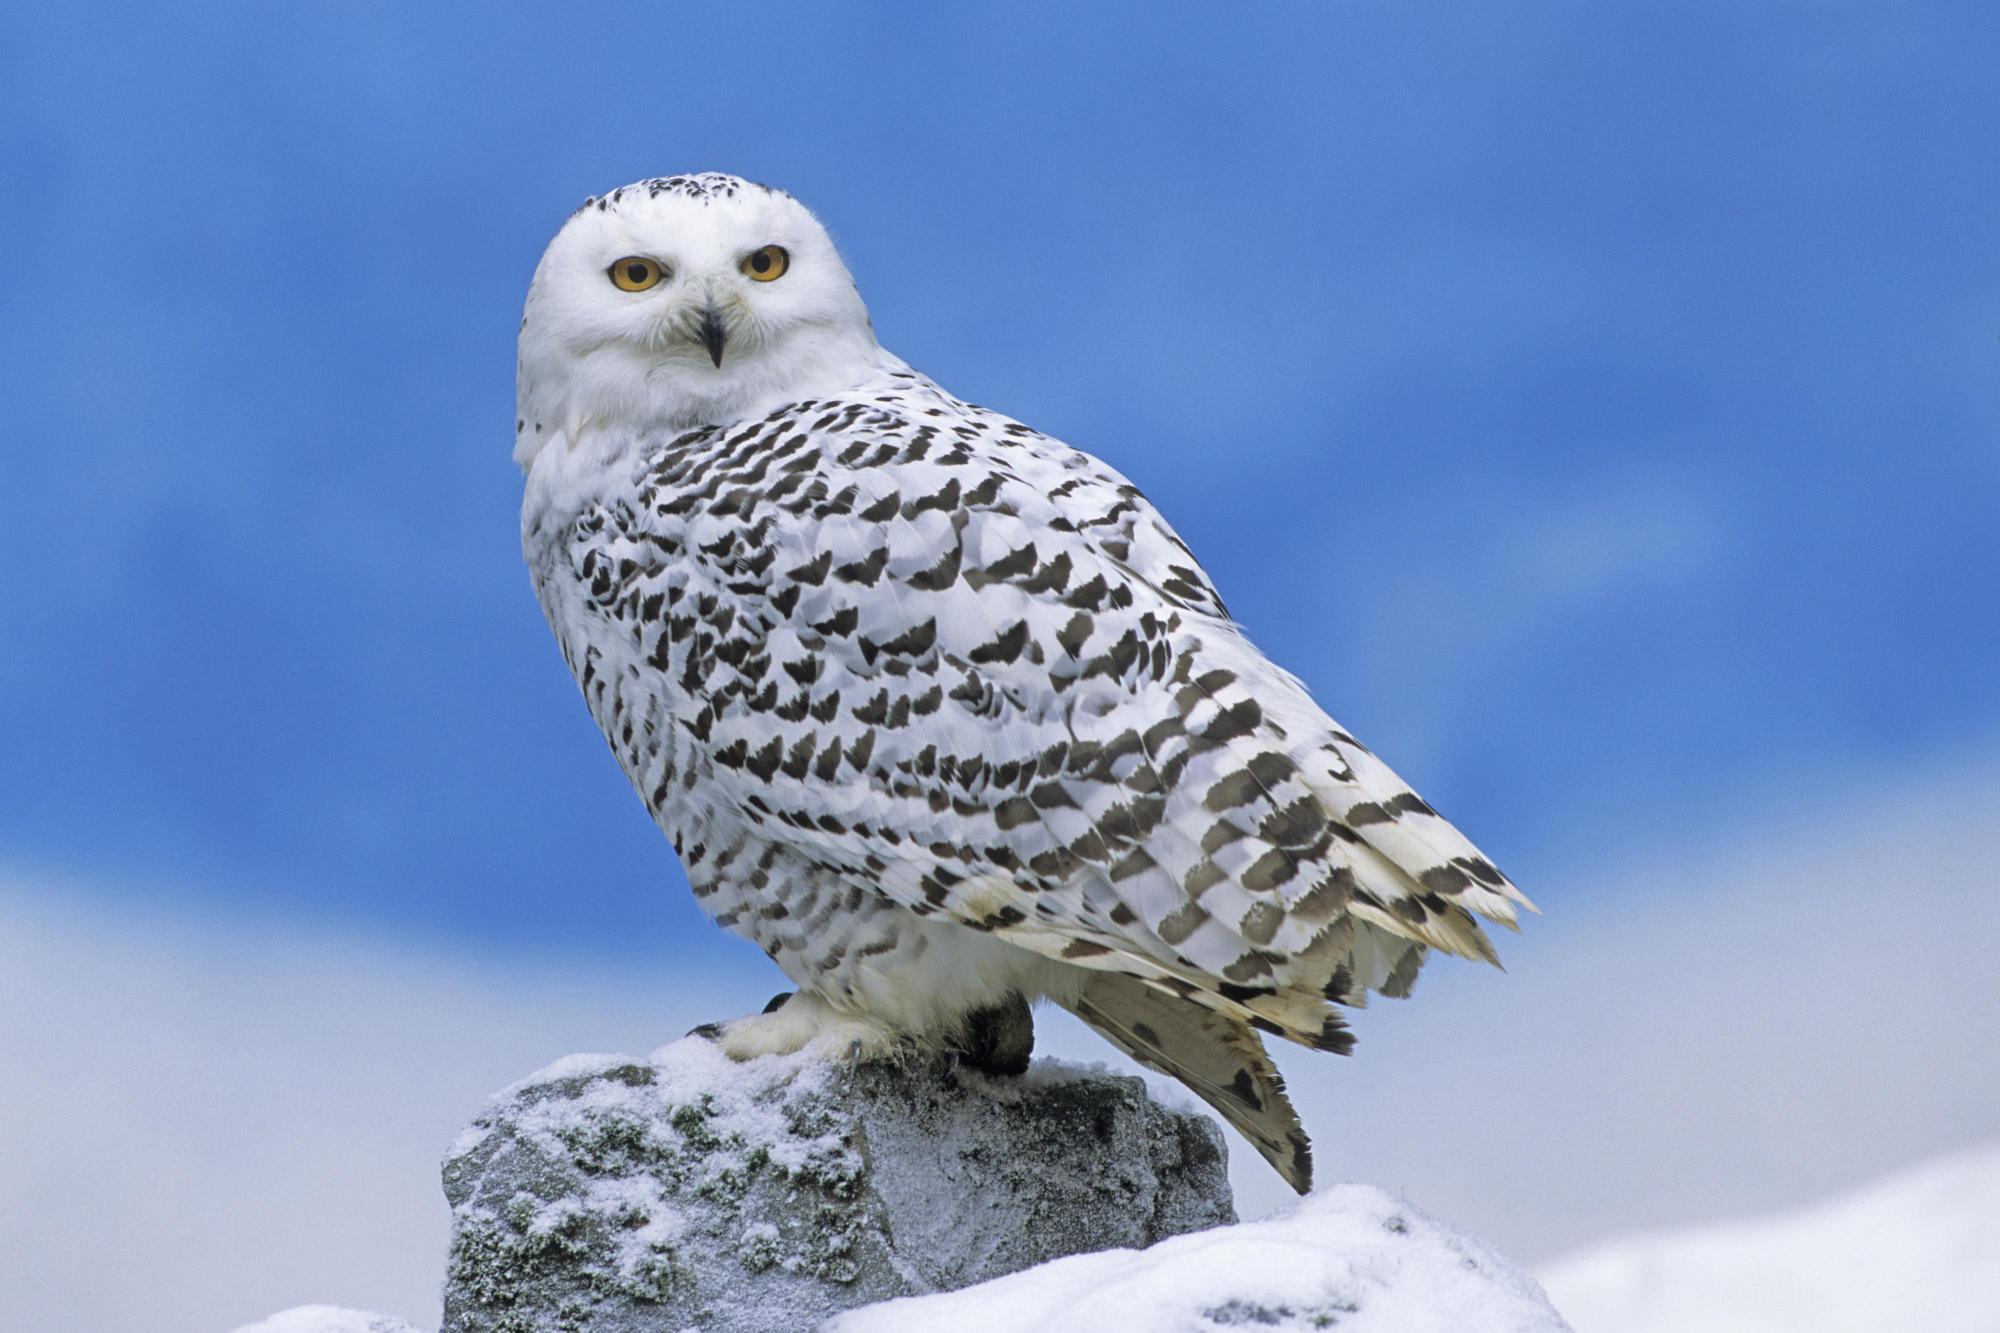 HD Wallpapers Snowy Owl